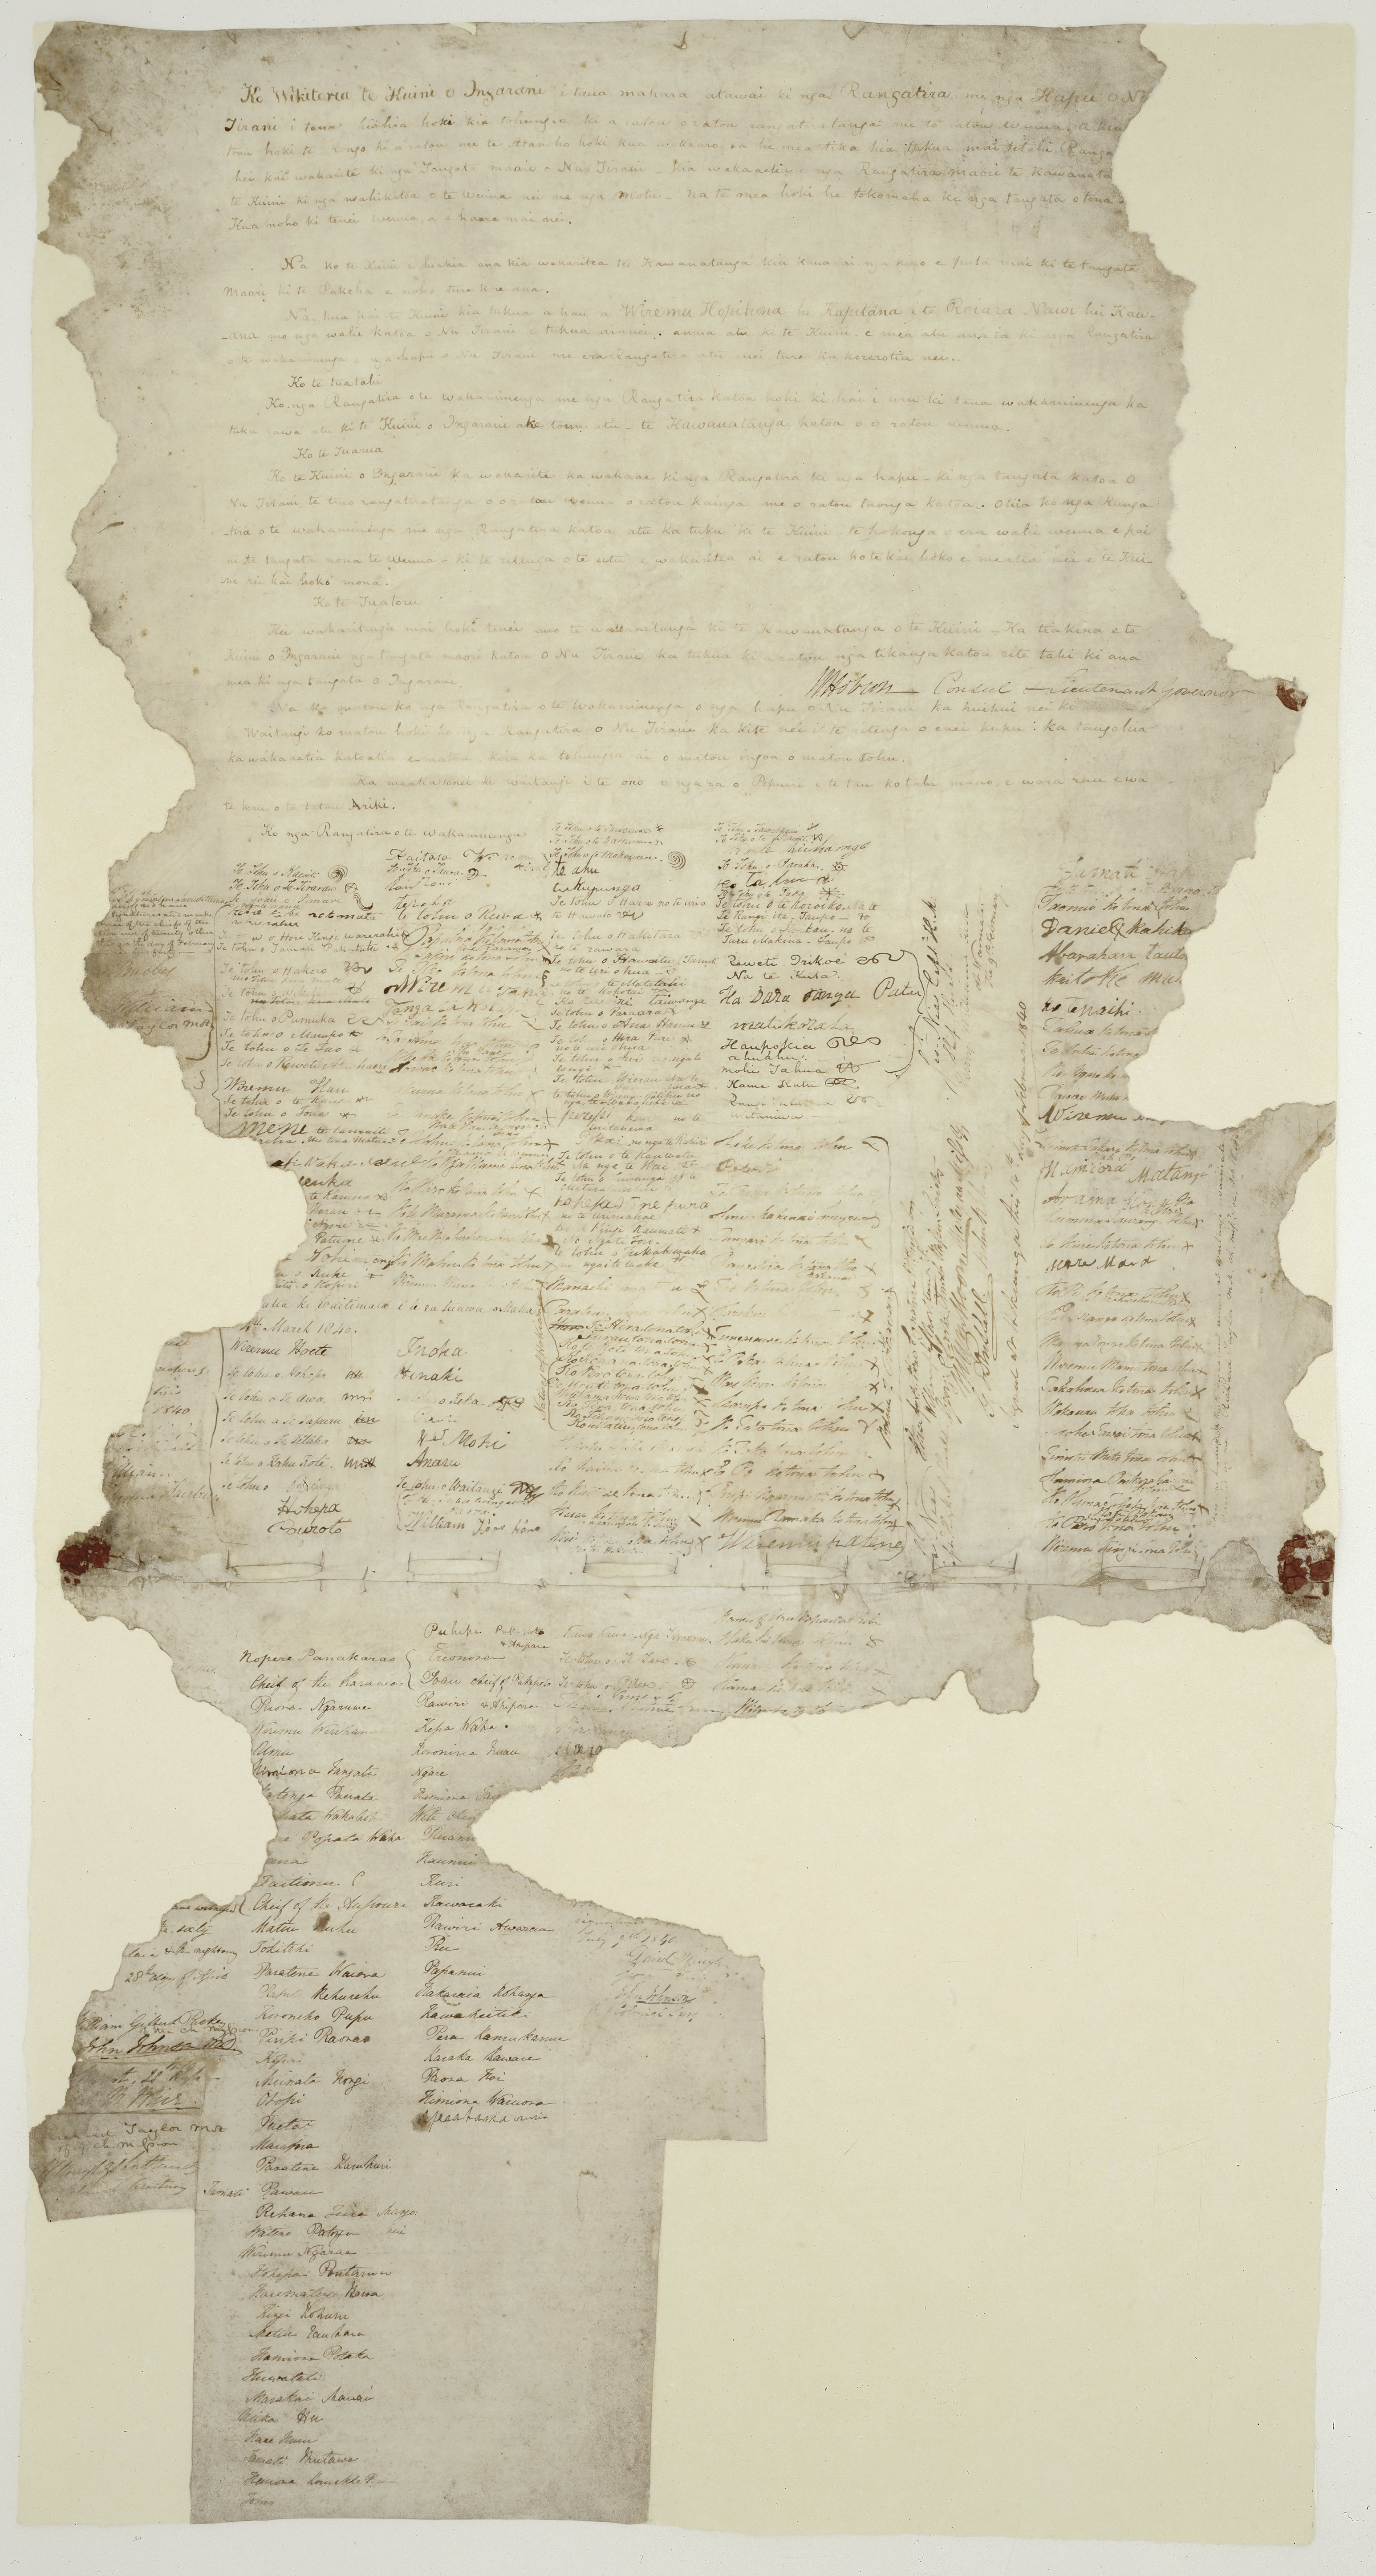 The Waitangi Sheet of the Treaty of Waitangi, signed between the British Crown and various Māori chiefs in 1840.